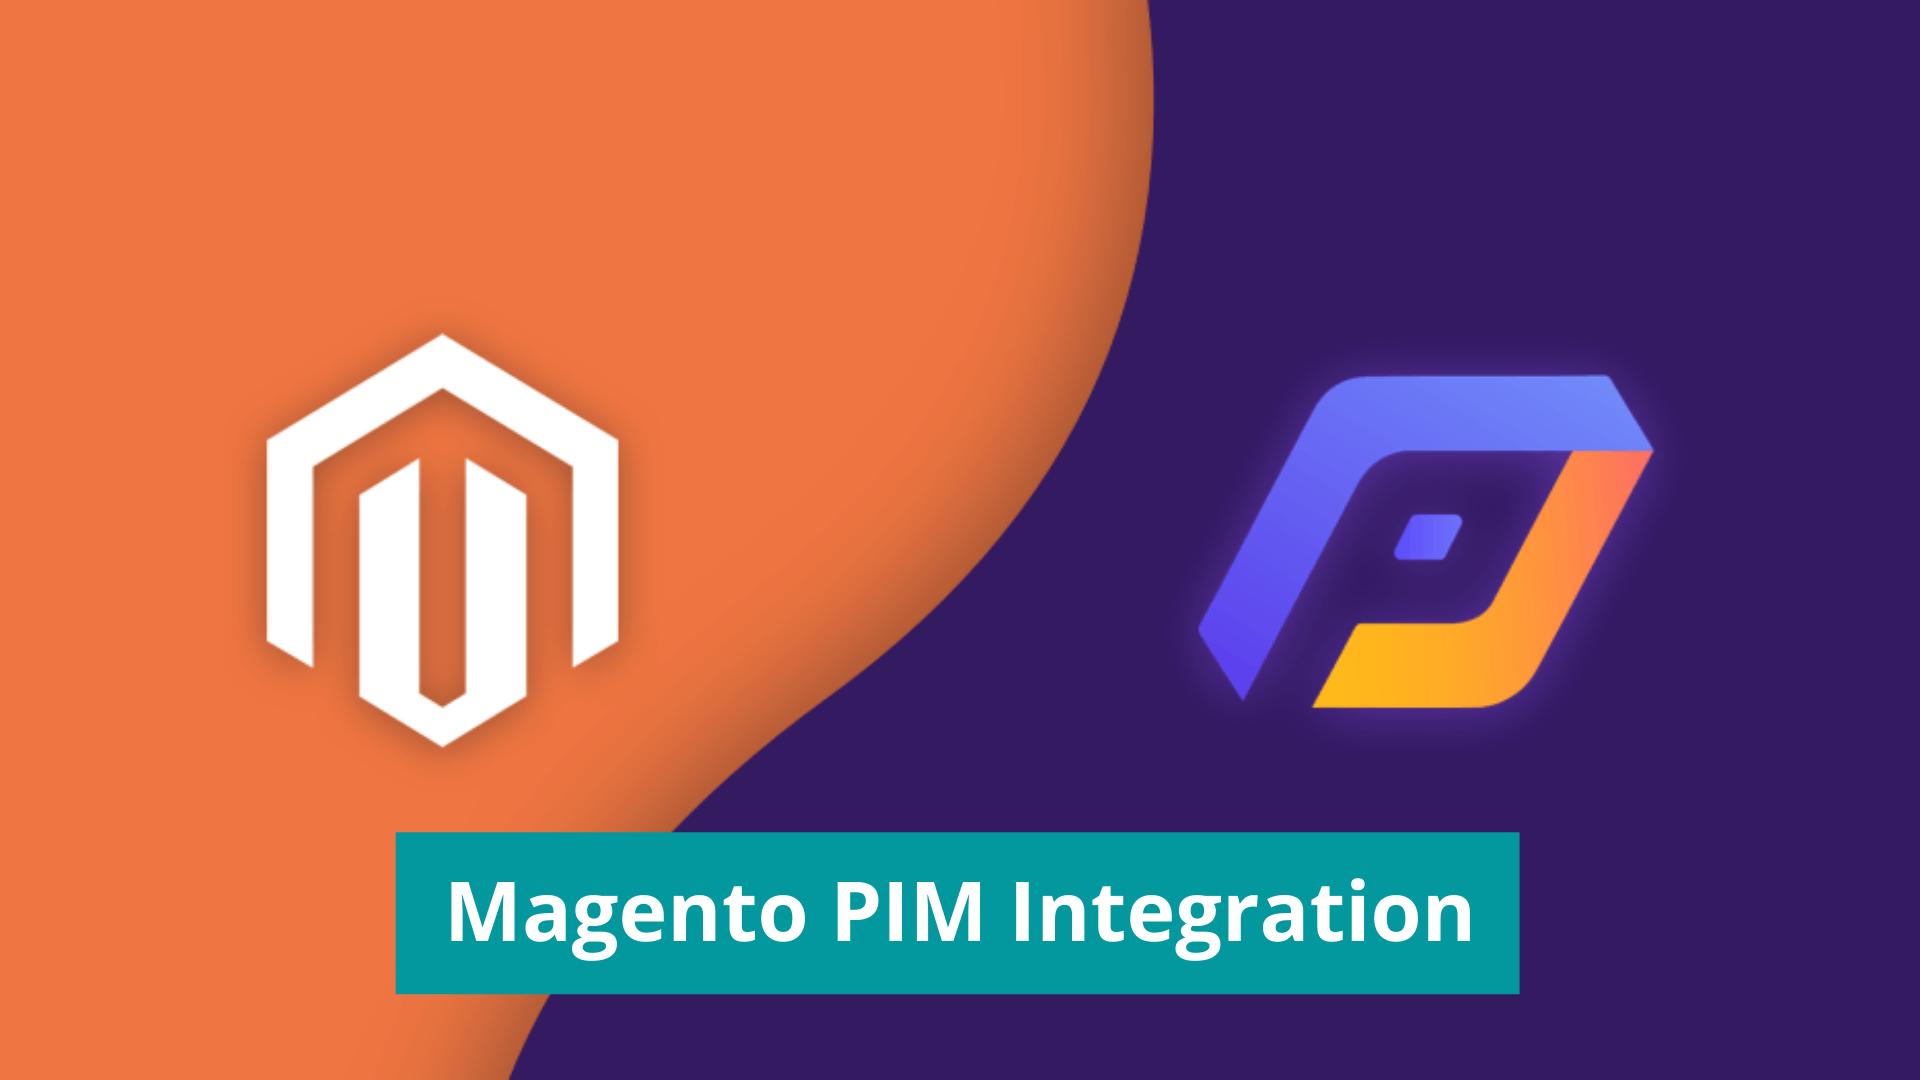 Magento PIM Integration for eCommerce